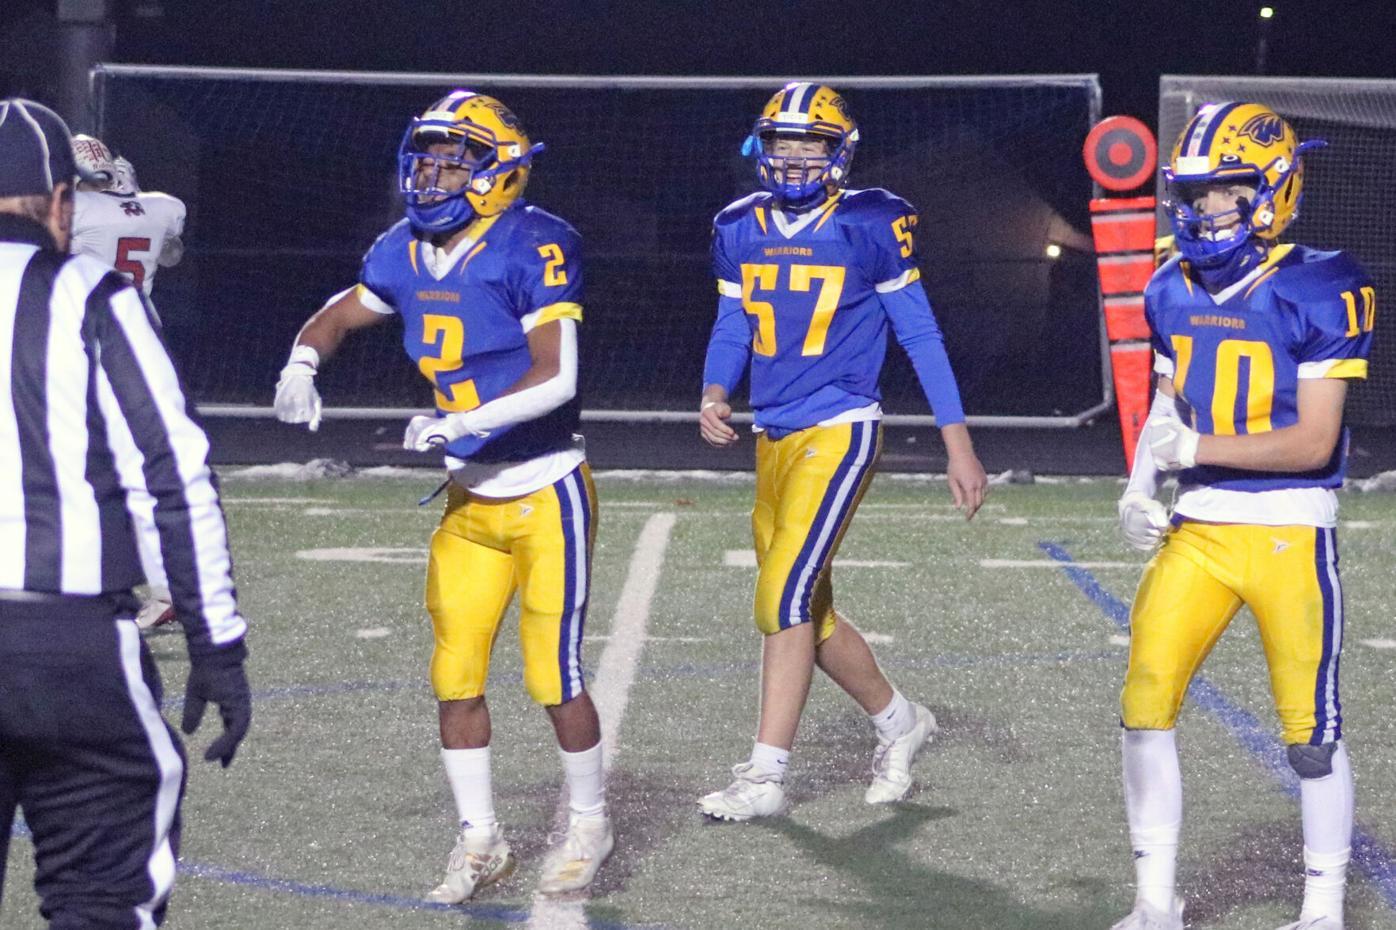 Rice Lake football vs. Medford 10-30-20